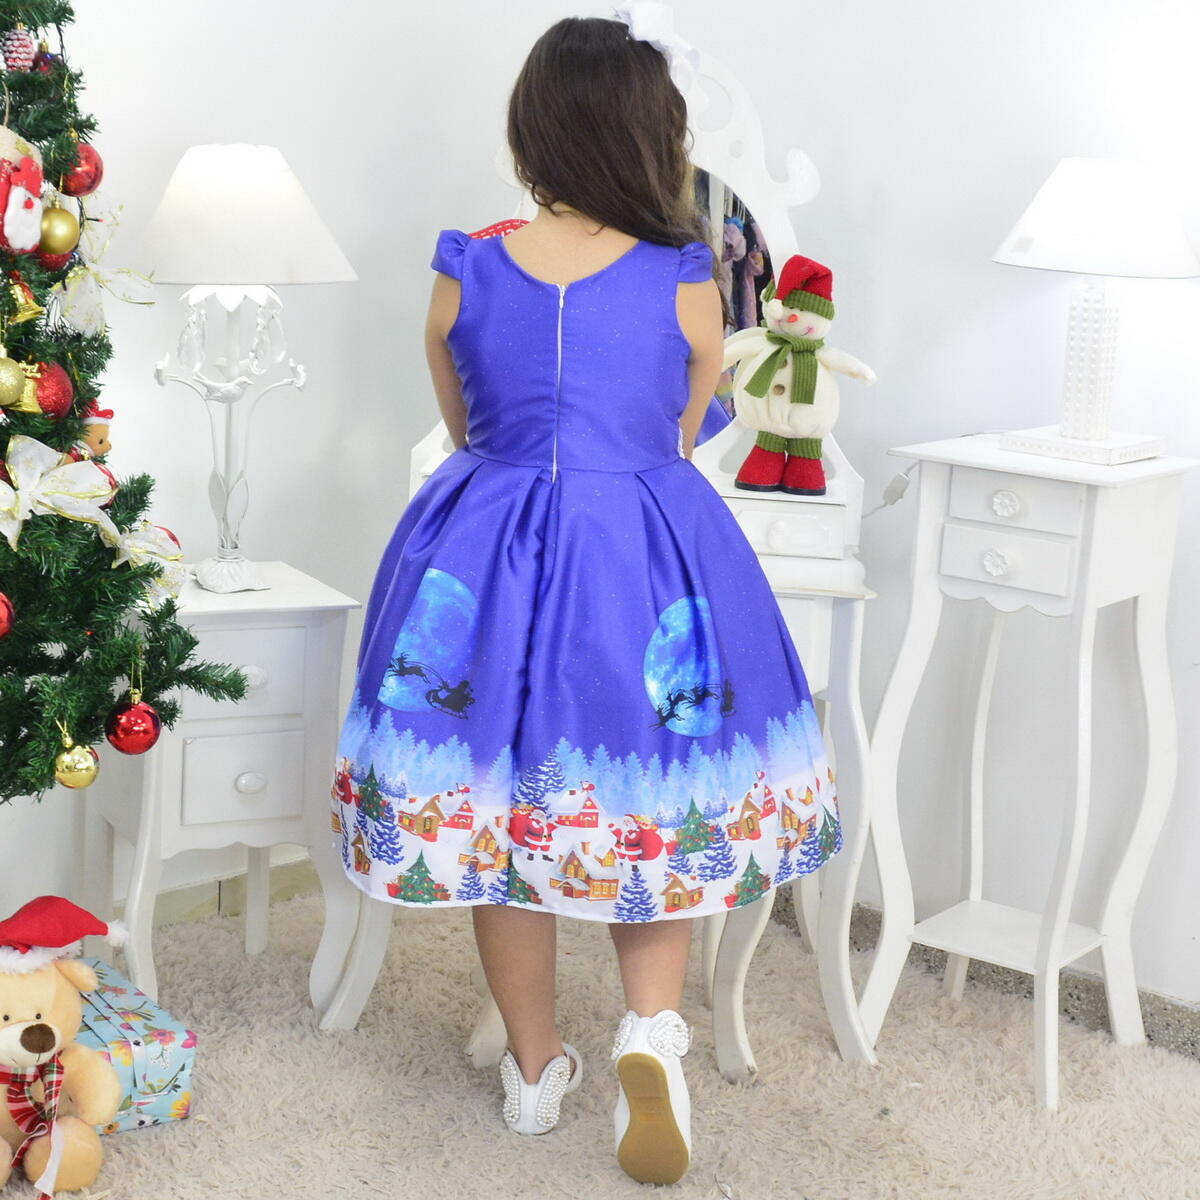 Vestido Natal Infantil Papai Noel Com Bolsa e Arvore de Montar